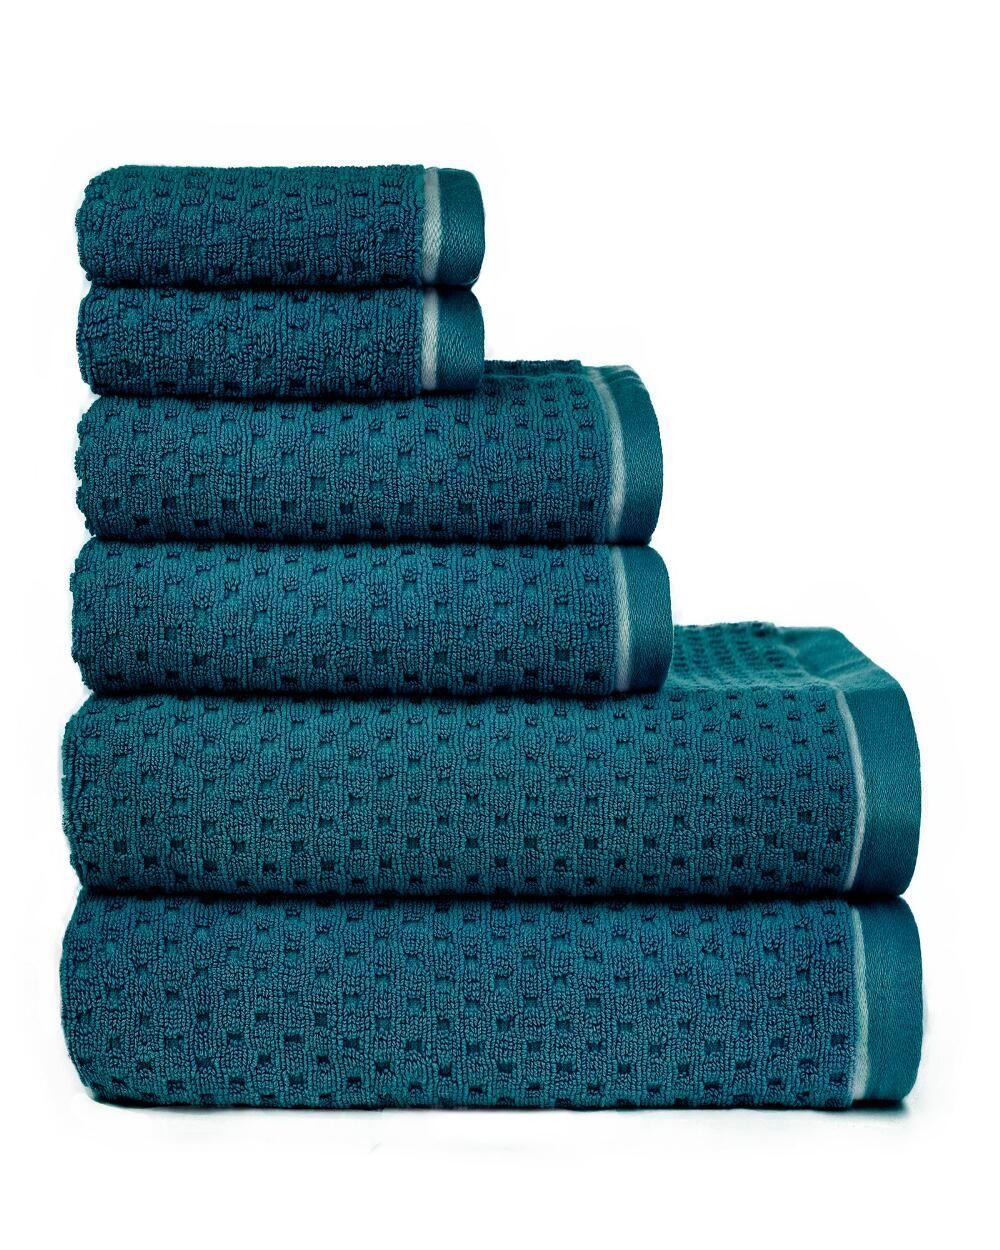 6 Piece Riley Textured Bath Towel Set Bath Towel Sets Bath